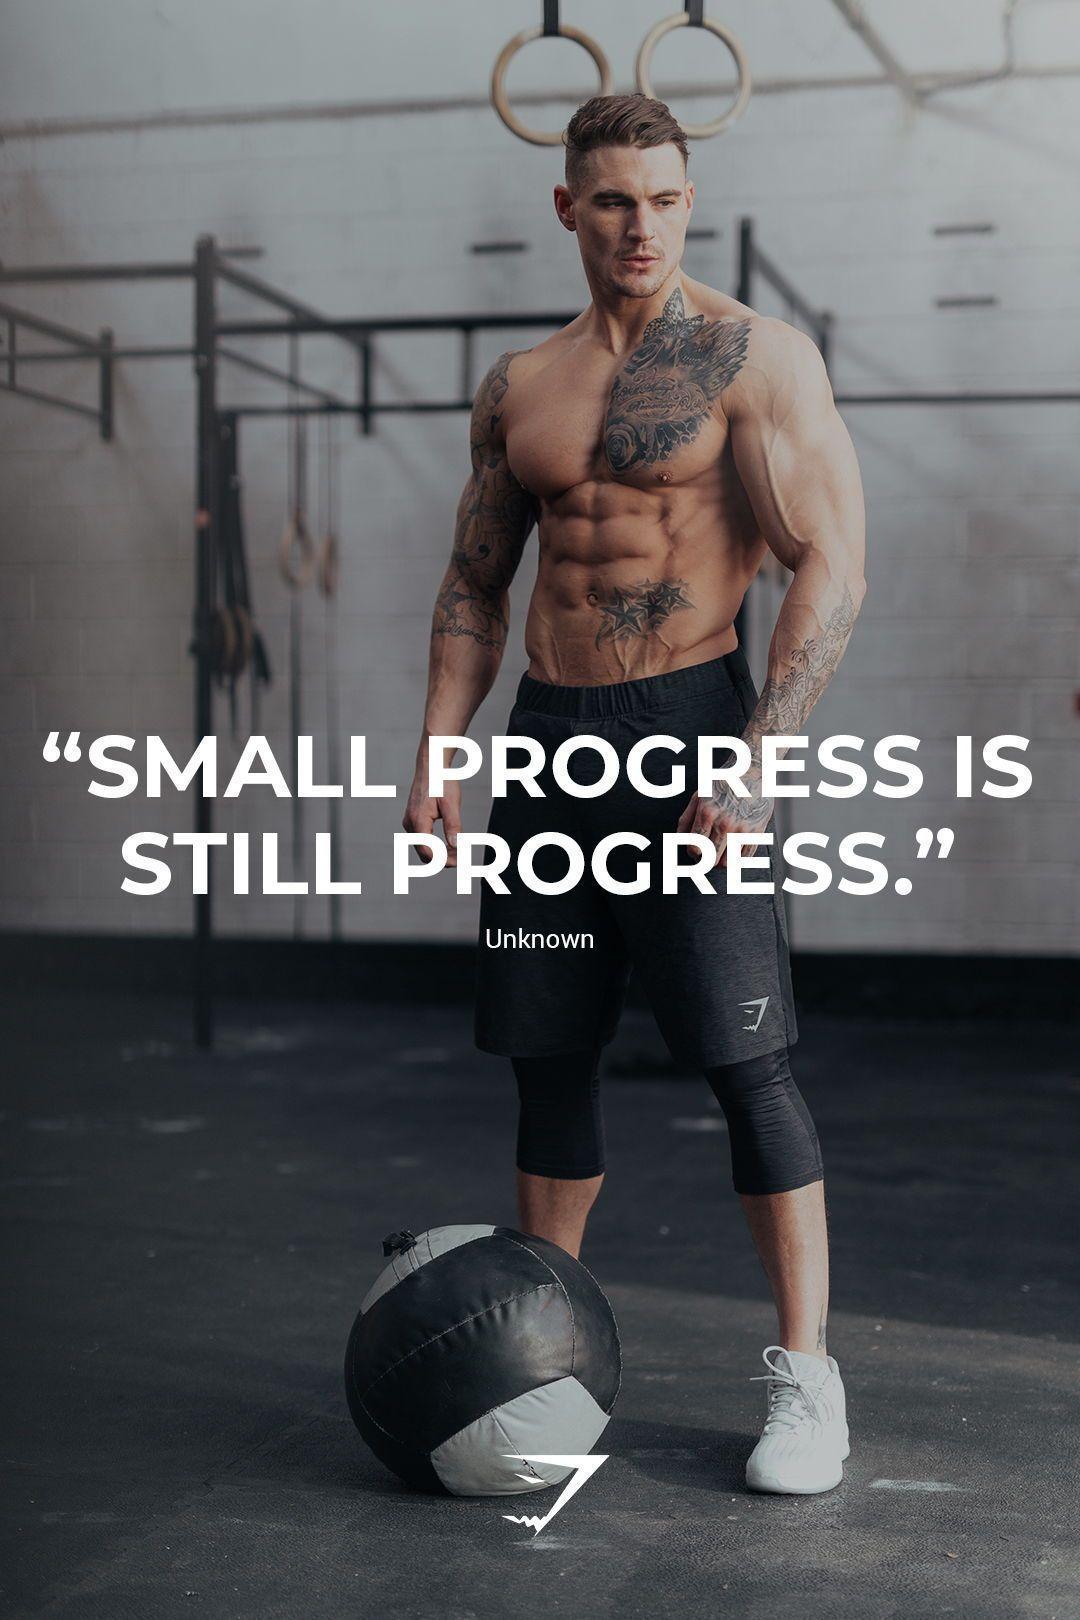 Fitness Quotes Badass Gym Gymloversfitness Frasesdemotivacion Goals Mens Fitness Motivation Fitness Motivation Inspiration Fitness Motivation Pictures